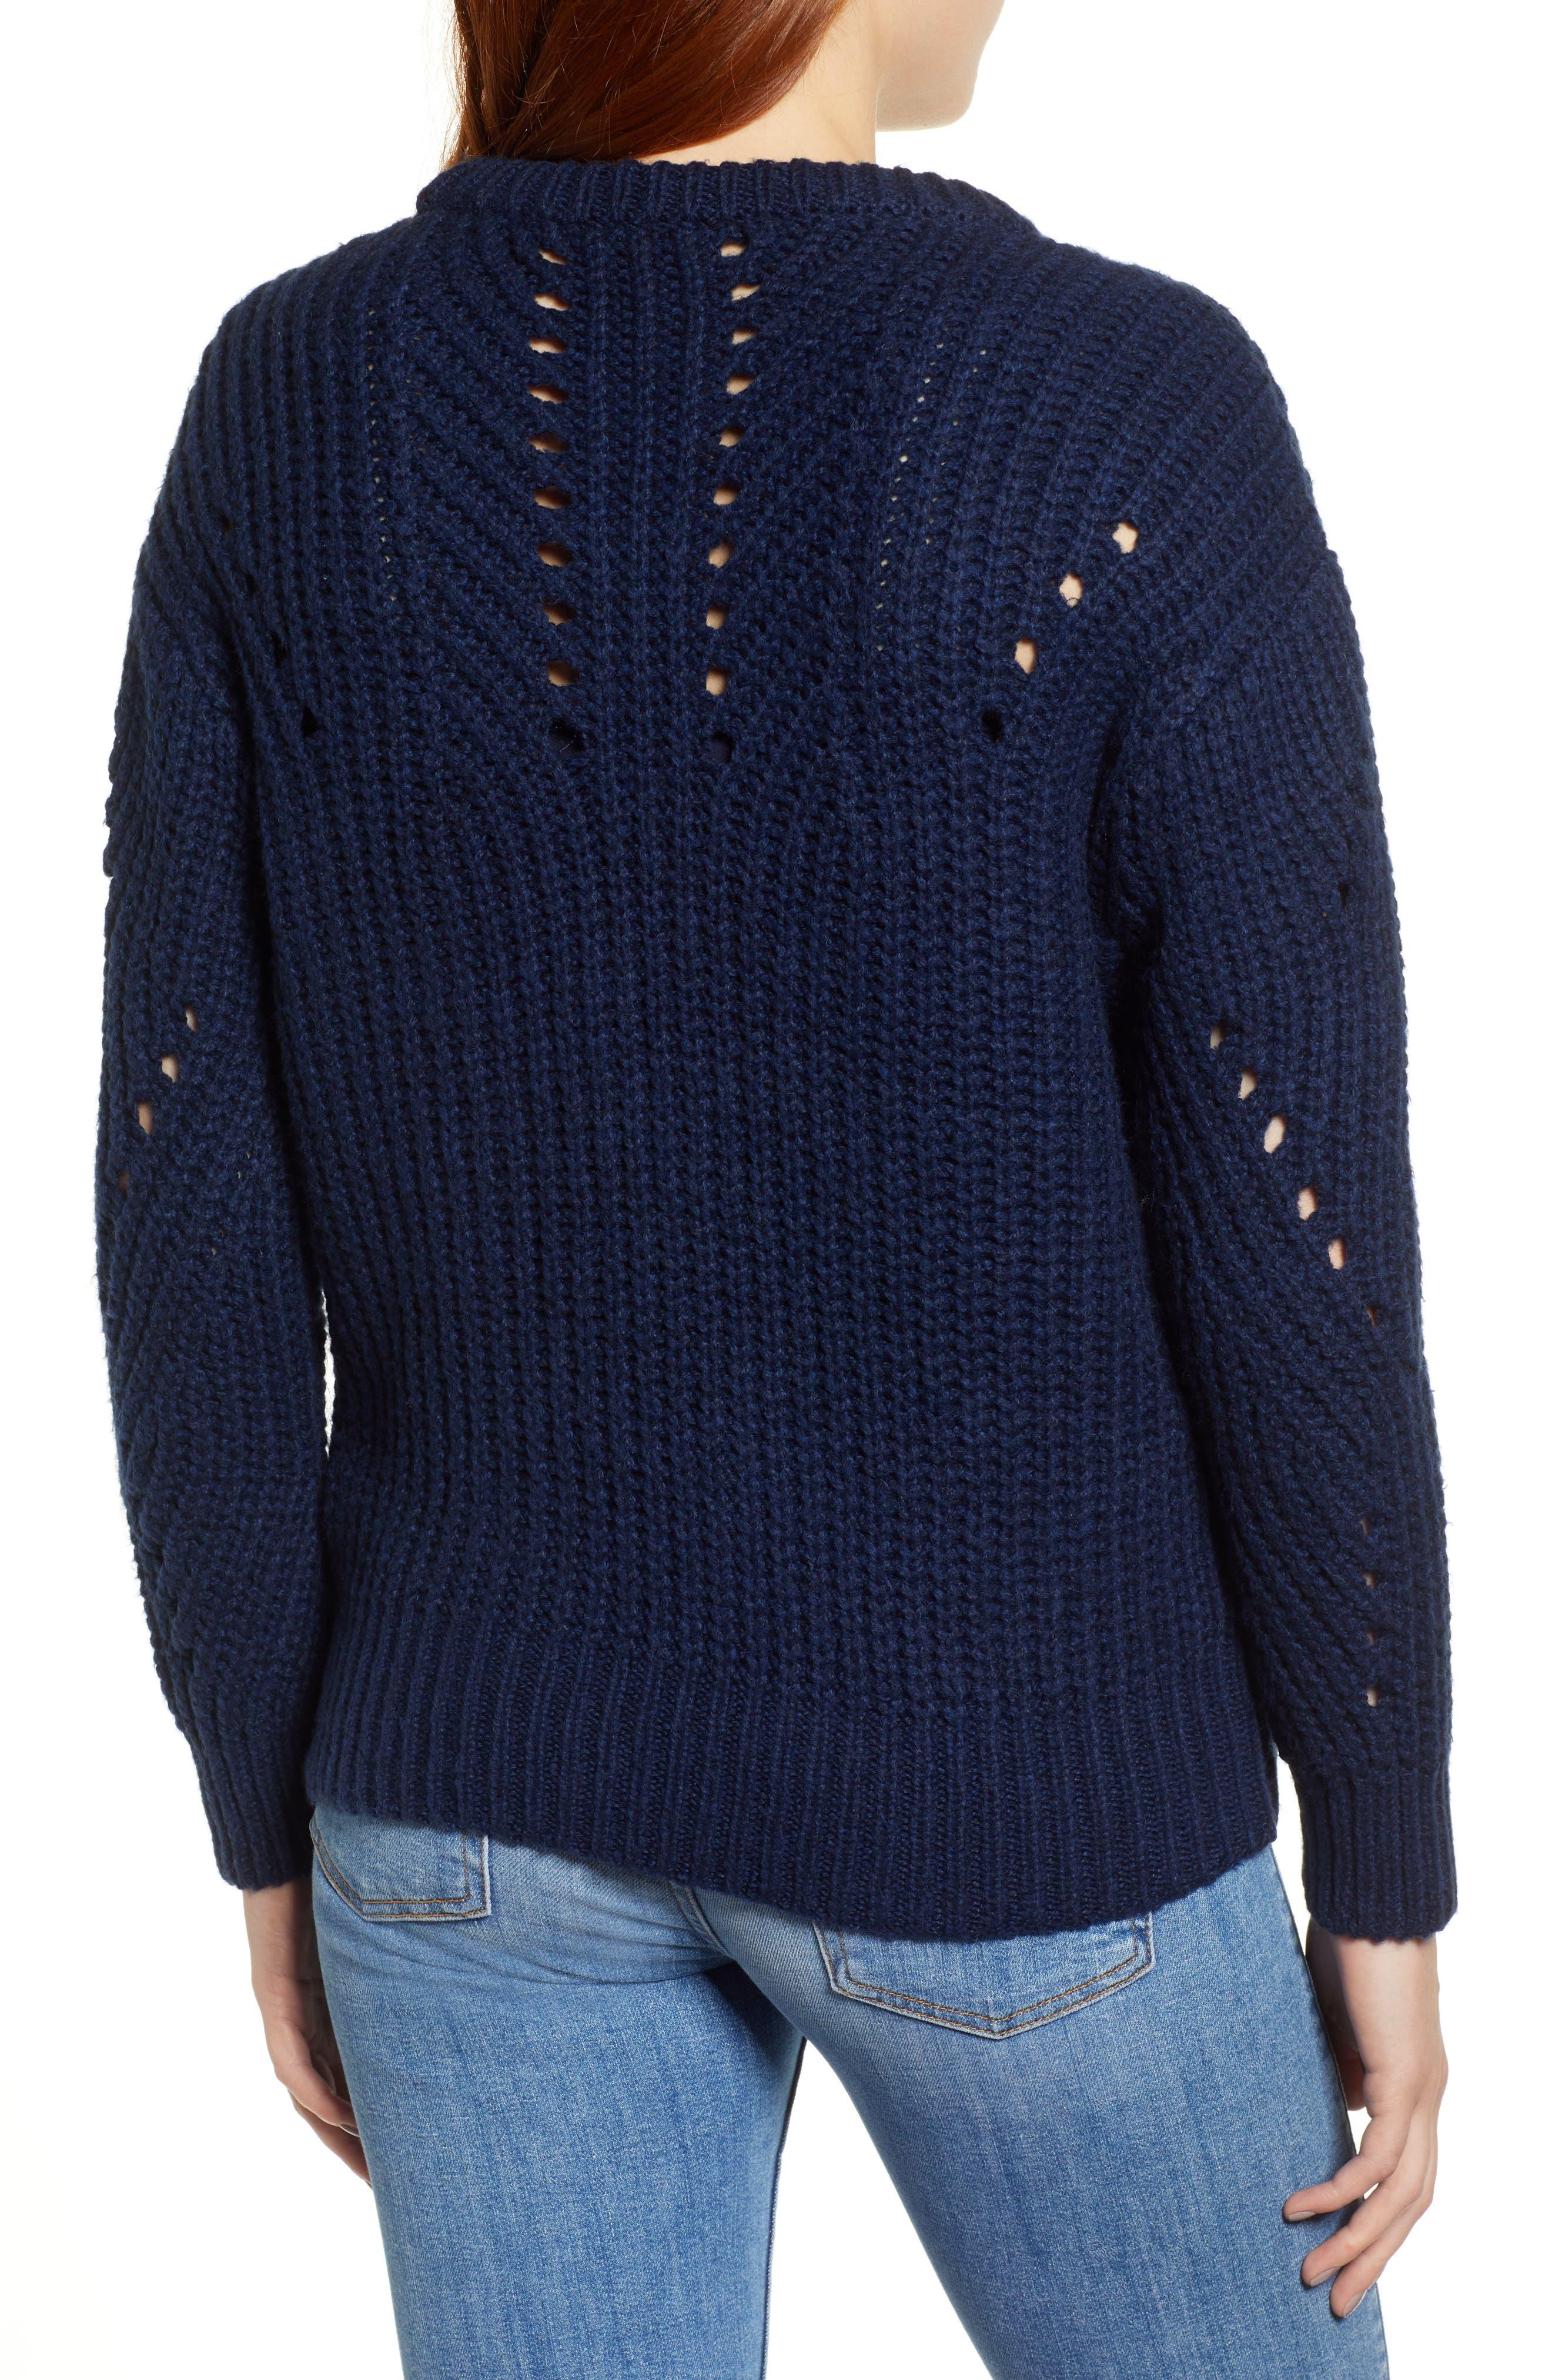 Rib Pointelle Detail Cotton Blend Sweater,                             Alternate thumbnail 2, color,                             CLASSIC NAVY